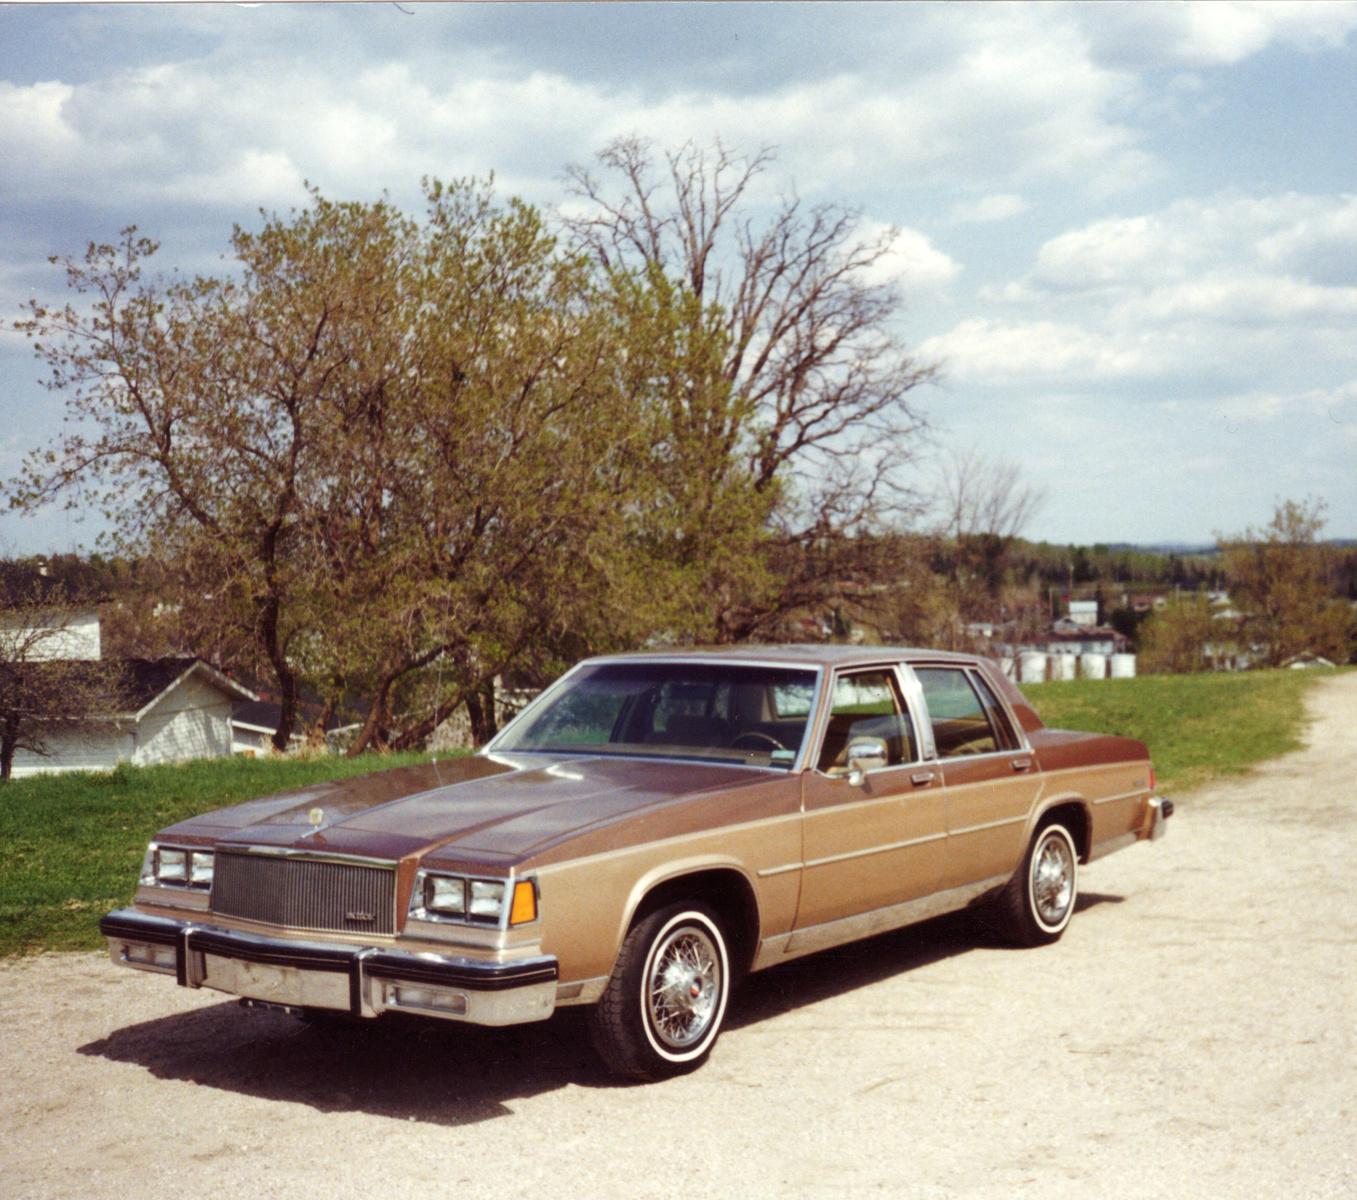 1995 Buick Roadmaster Interior: 1985 Buick LeSabre